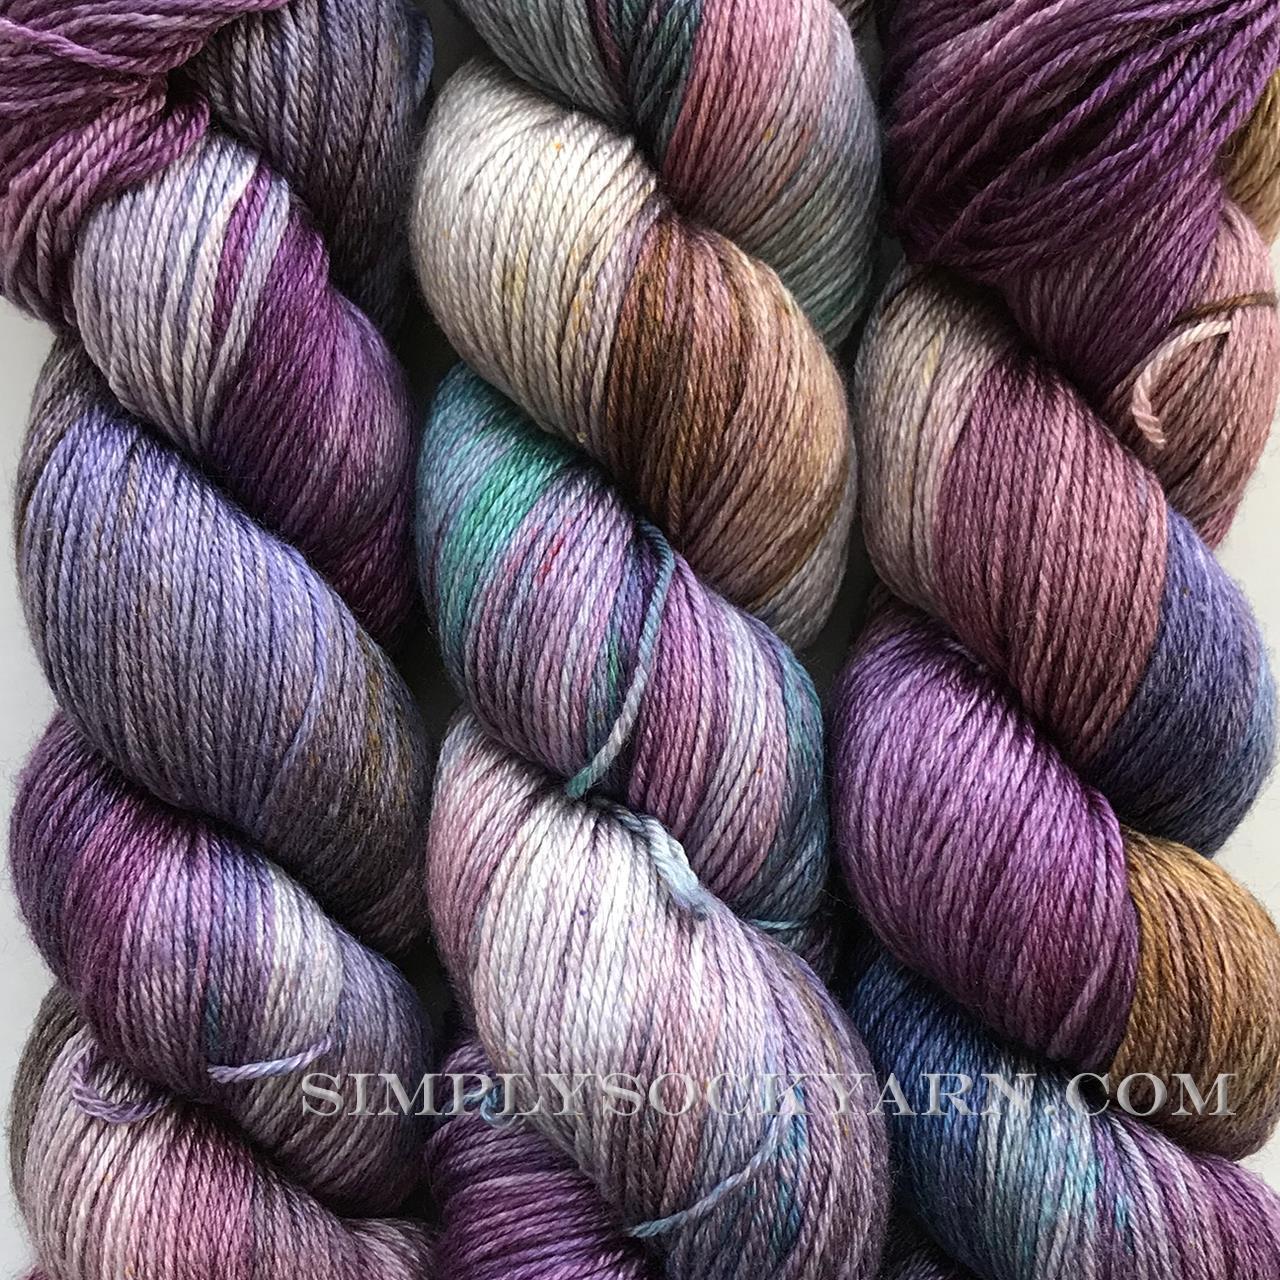 LITLG Silk Amethyst -